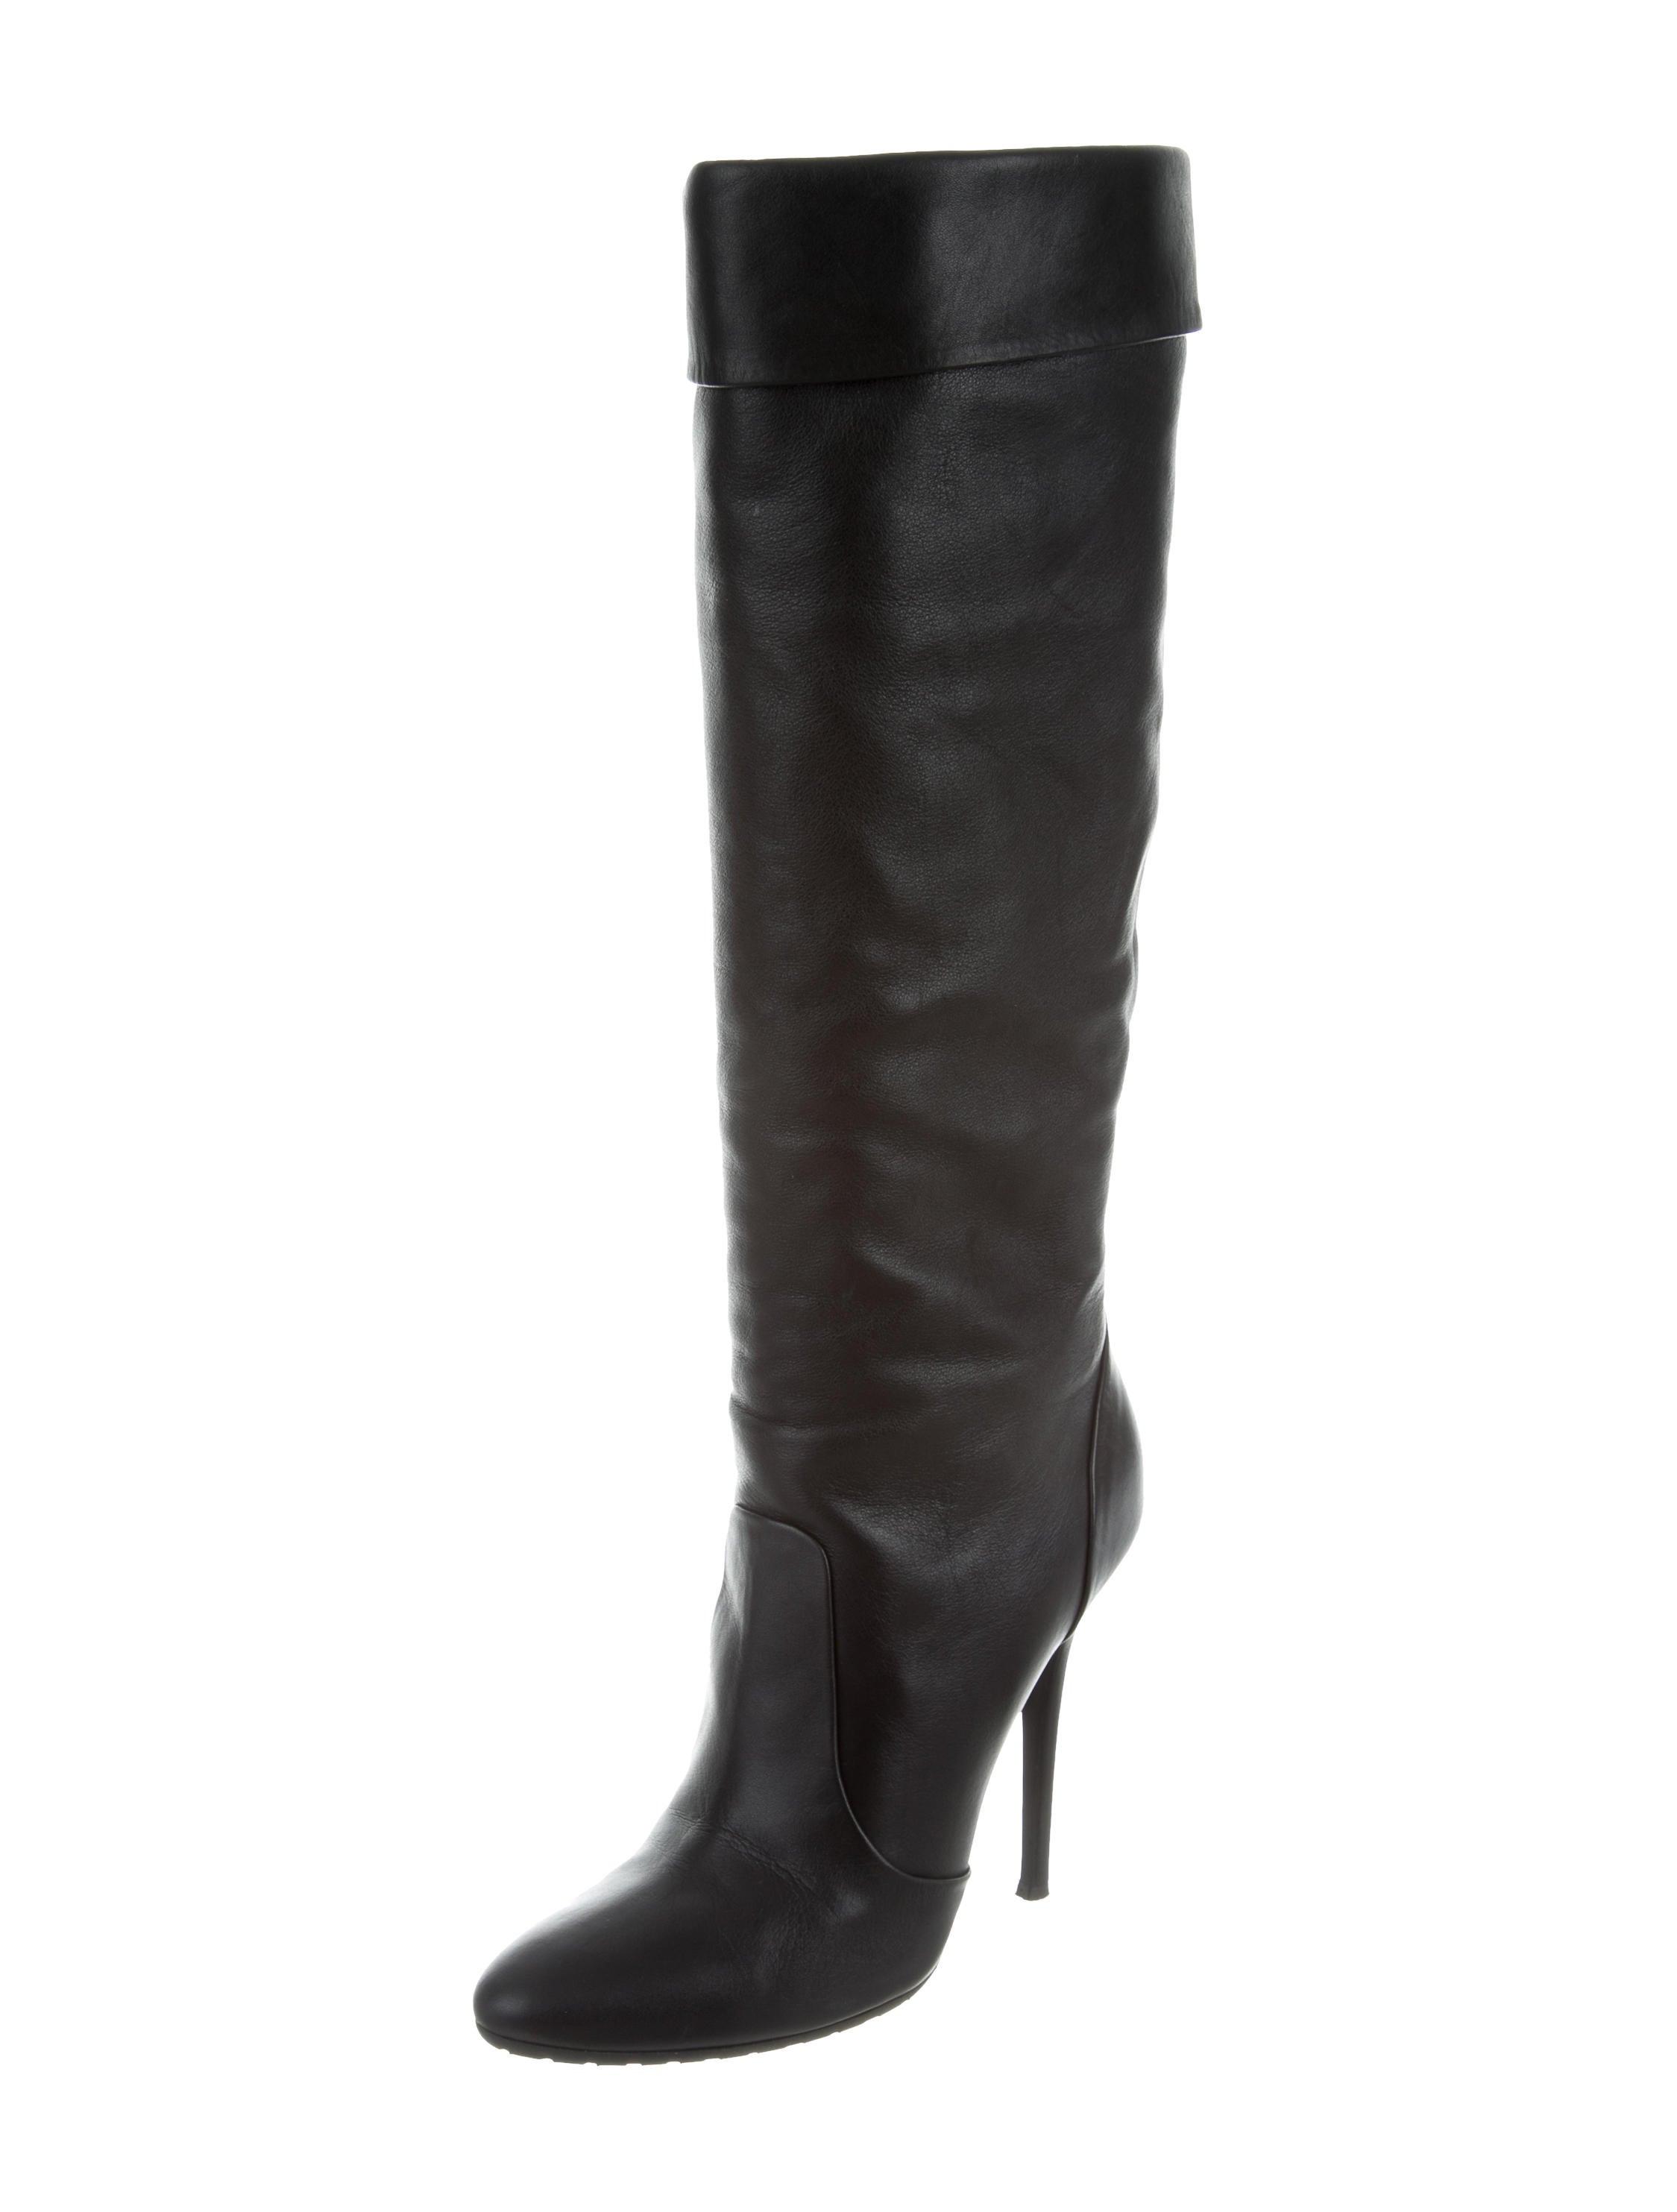 giuseppe zanotti leather knee high boots shoes